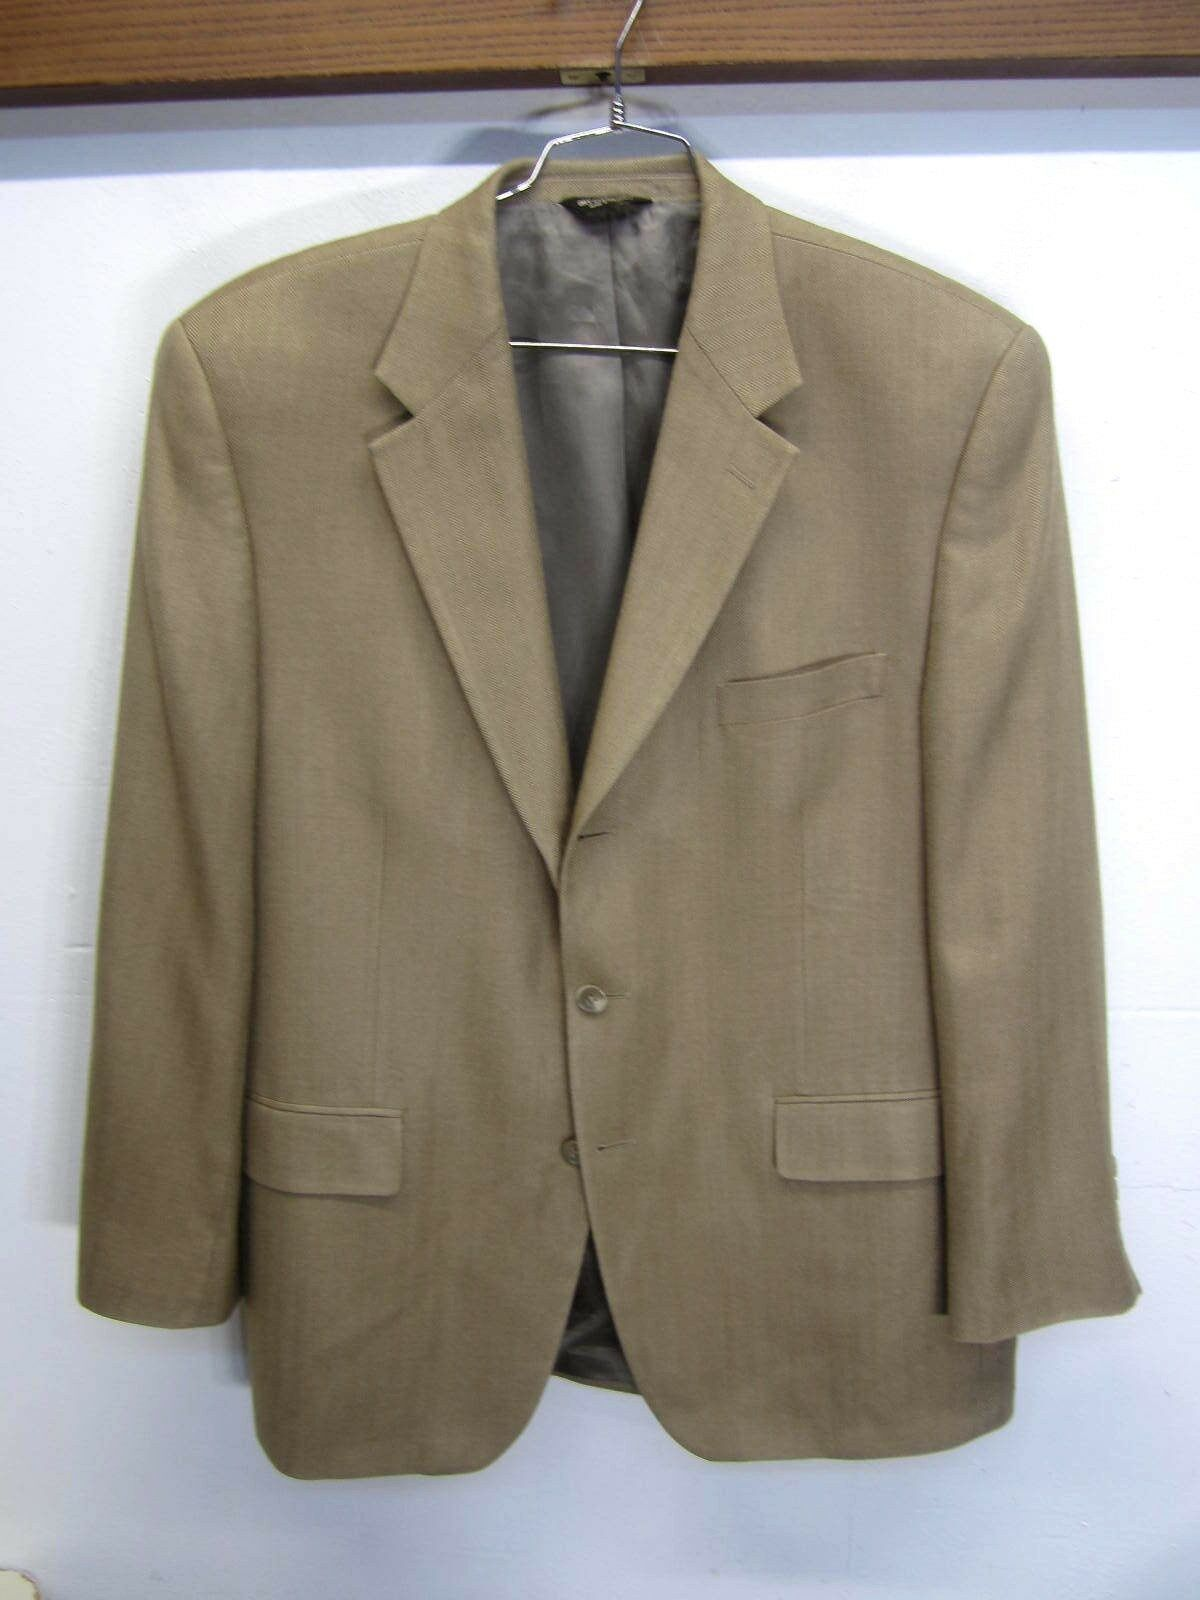 Vtg Chaps Ralph Lauren Blazer Sport Coat 3 btn tan herringbone silk sz 42R EUC